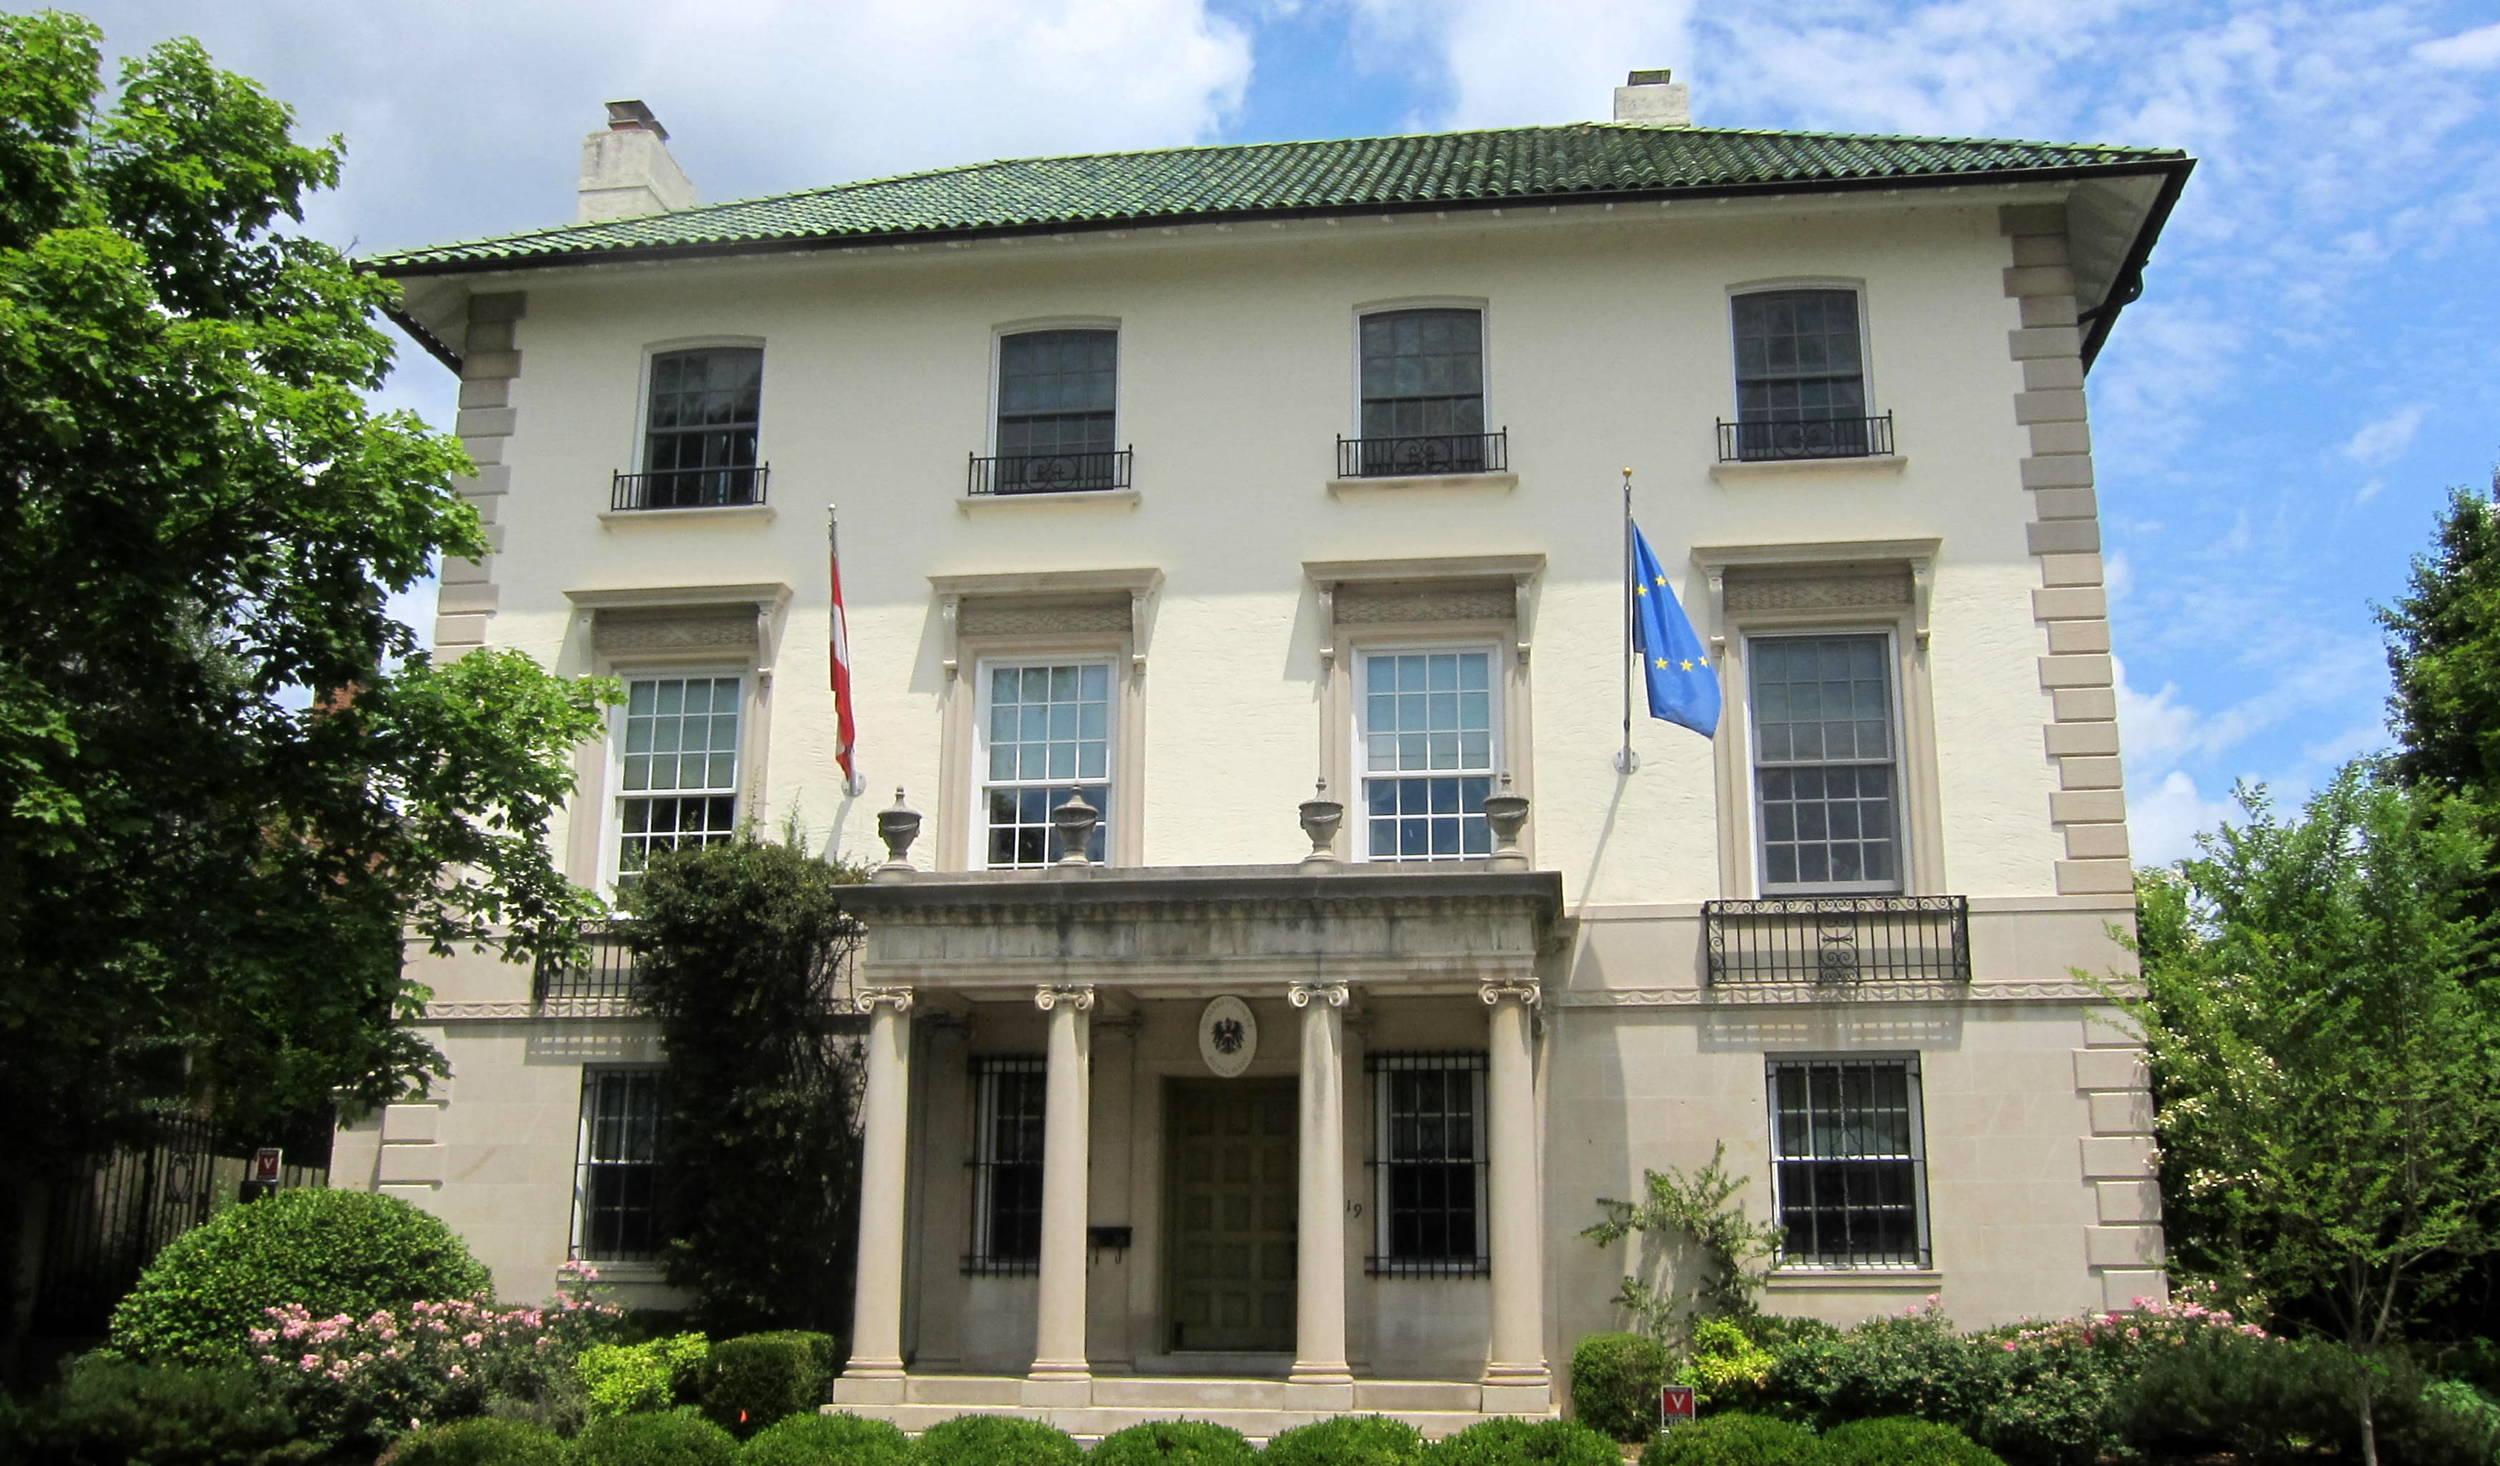 Residence of the Austrian Ambassador, designed byAppleton P. Clark, Jr.in 1926on2419 Wyoming Avenue,N.W. Photo: Wikimedia/ AgnosticPreachersKid